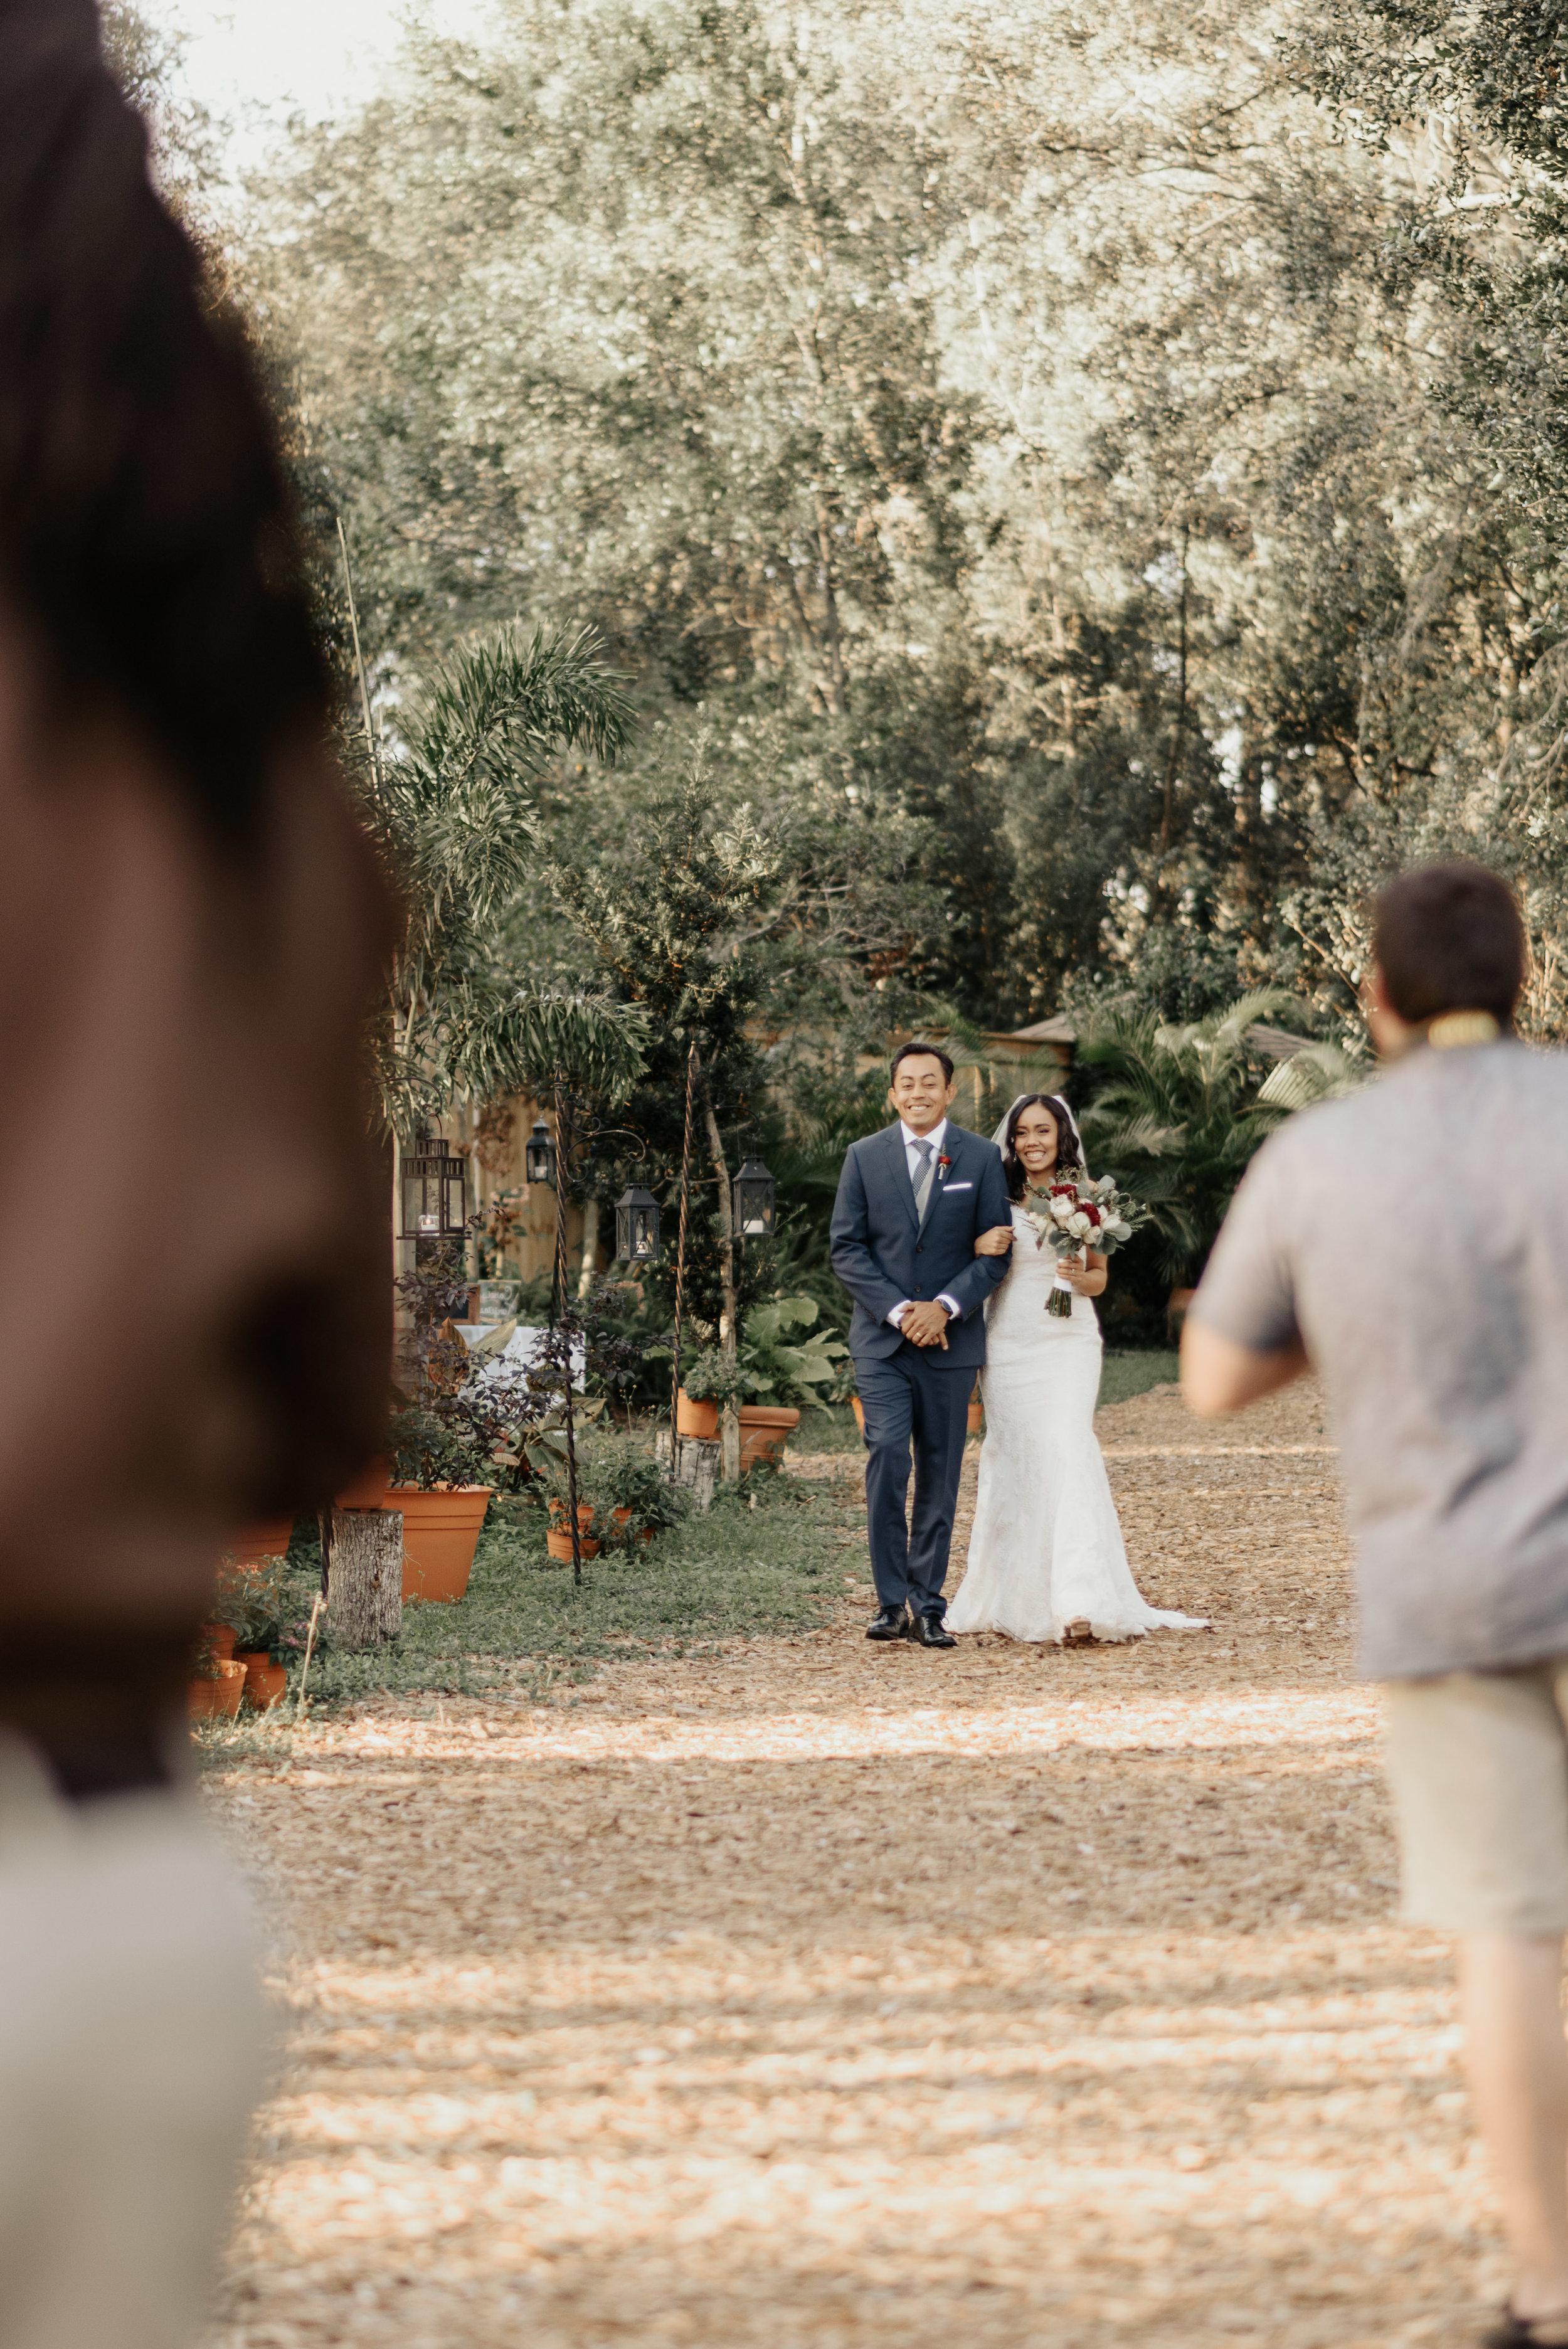 Kirstie-AJ-Wedding-9905.jpg